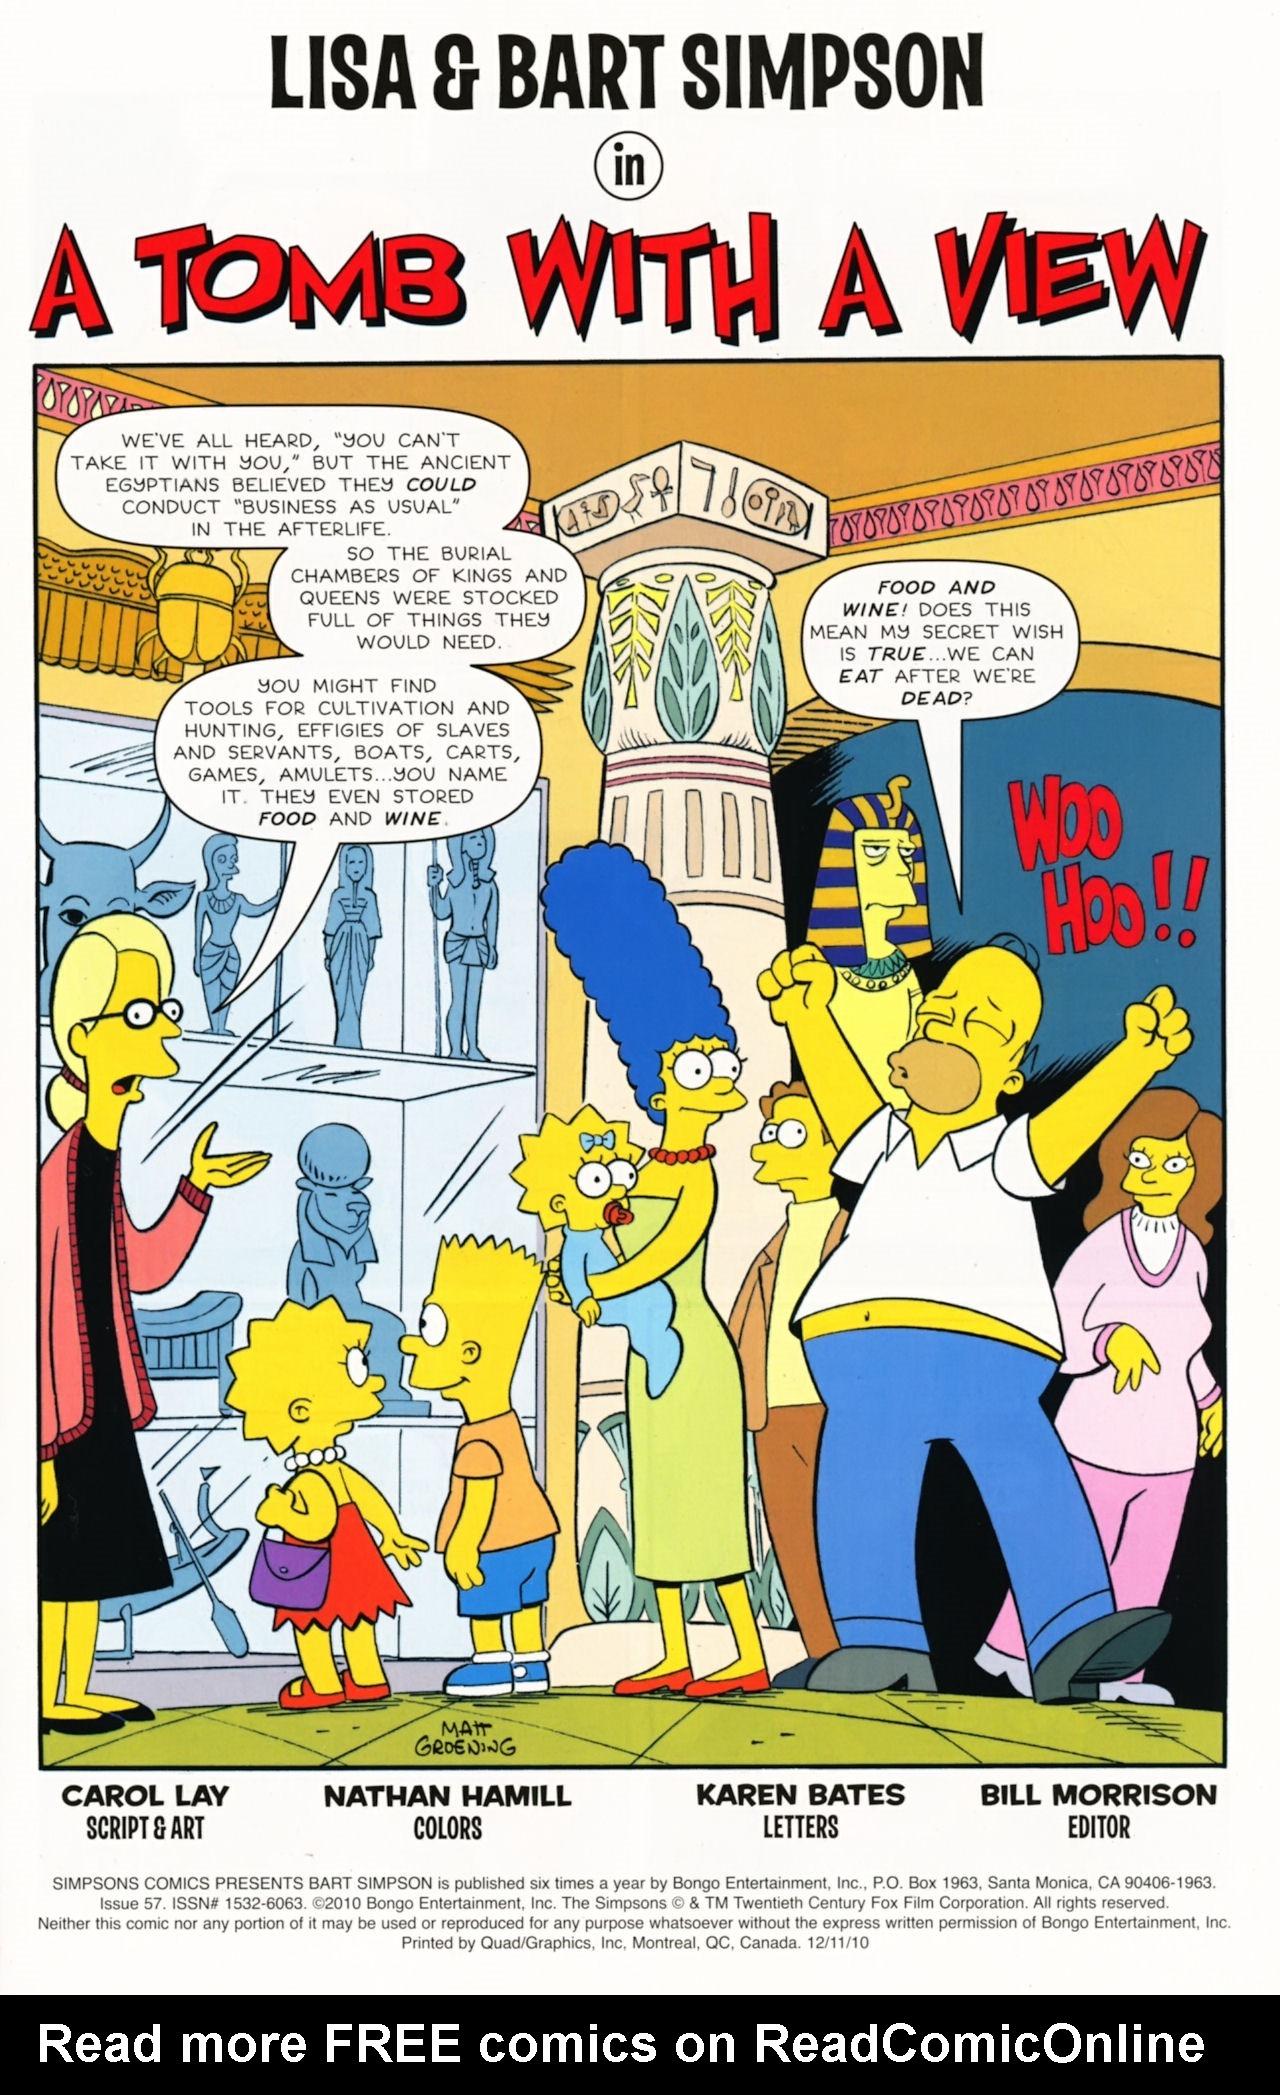 Read online Simpsons Comics Presents Bart Simpson comic -  Issue #57 - 3